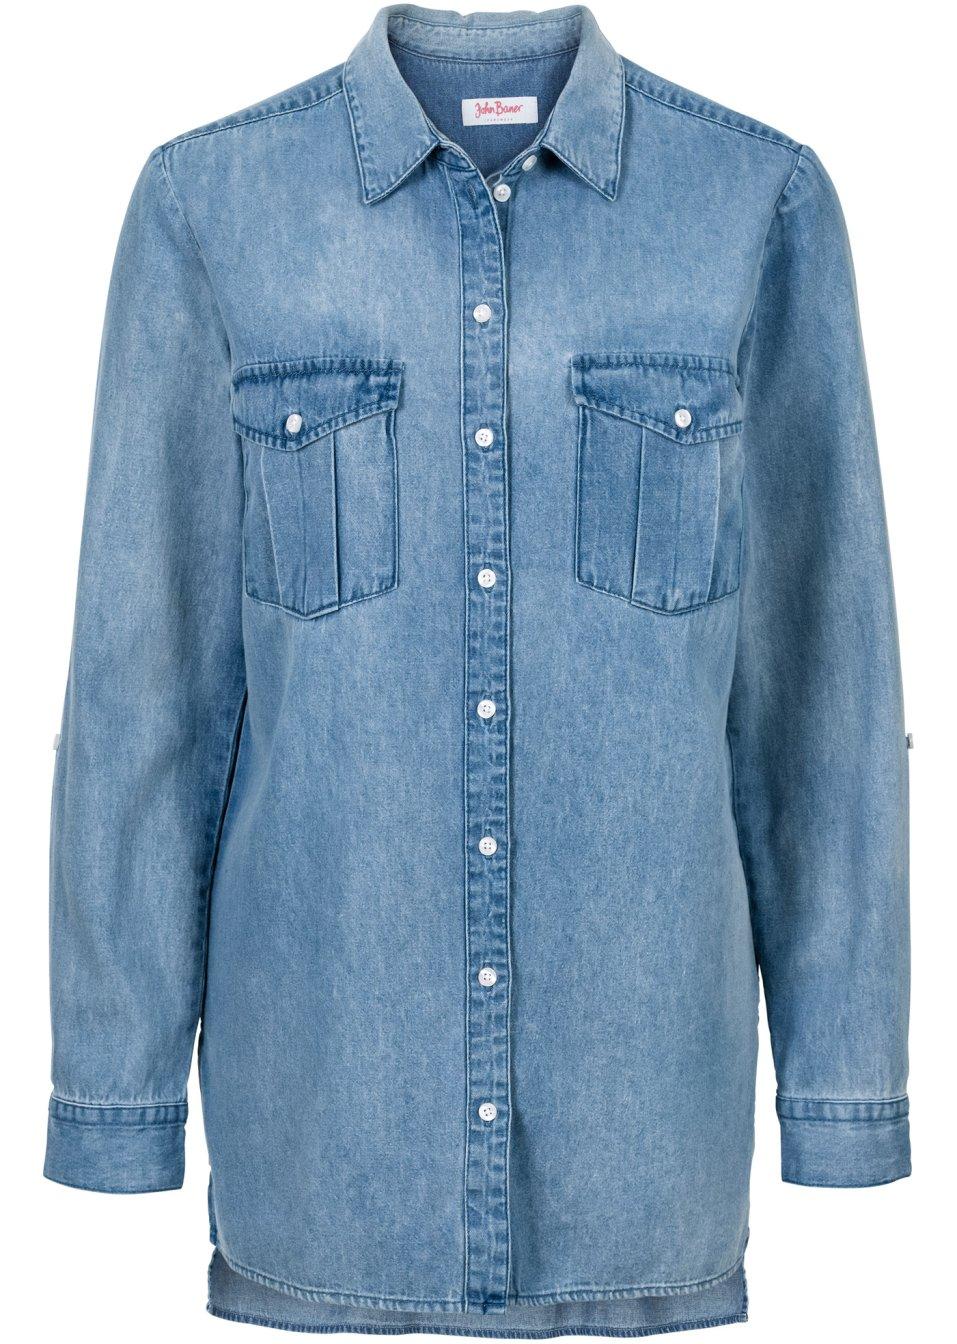 chemise en jean extra longue manches longues bleu clair john baner jeanswear acheter online. Black Bedroom Furniture Sets. Home Design Ideas